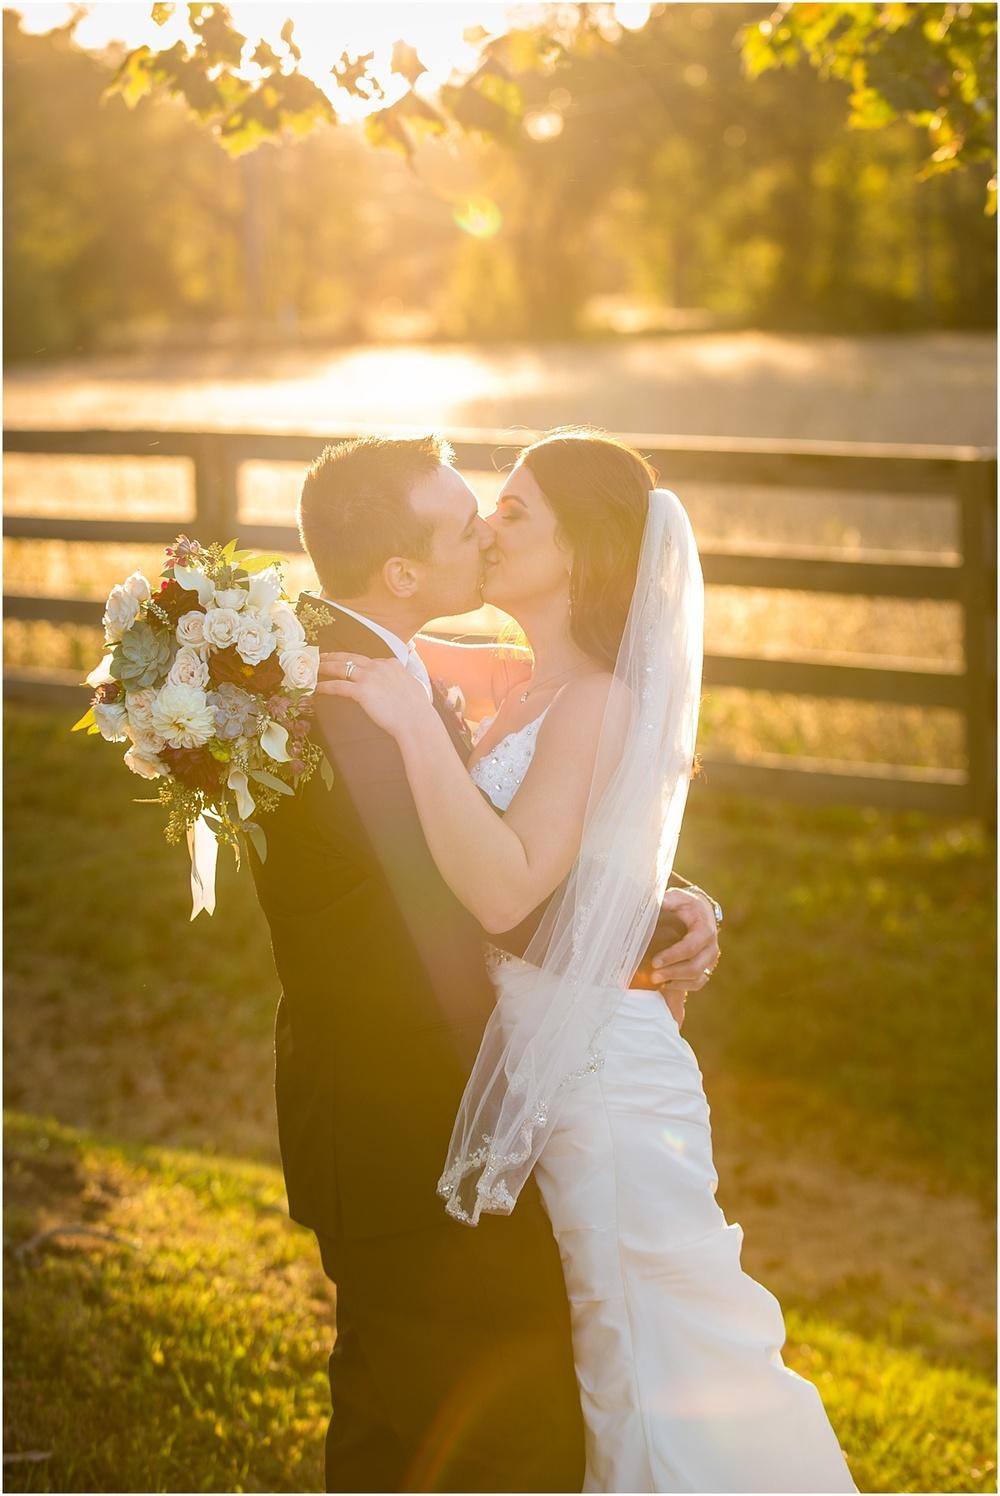 Greg Smit Photography Nashville wedding photographer Mint Springs Farm_0172